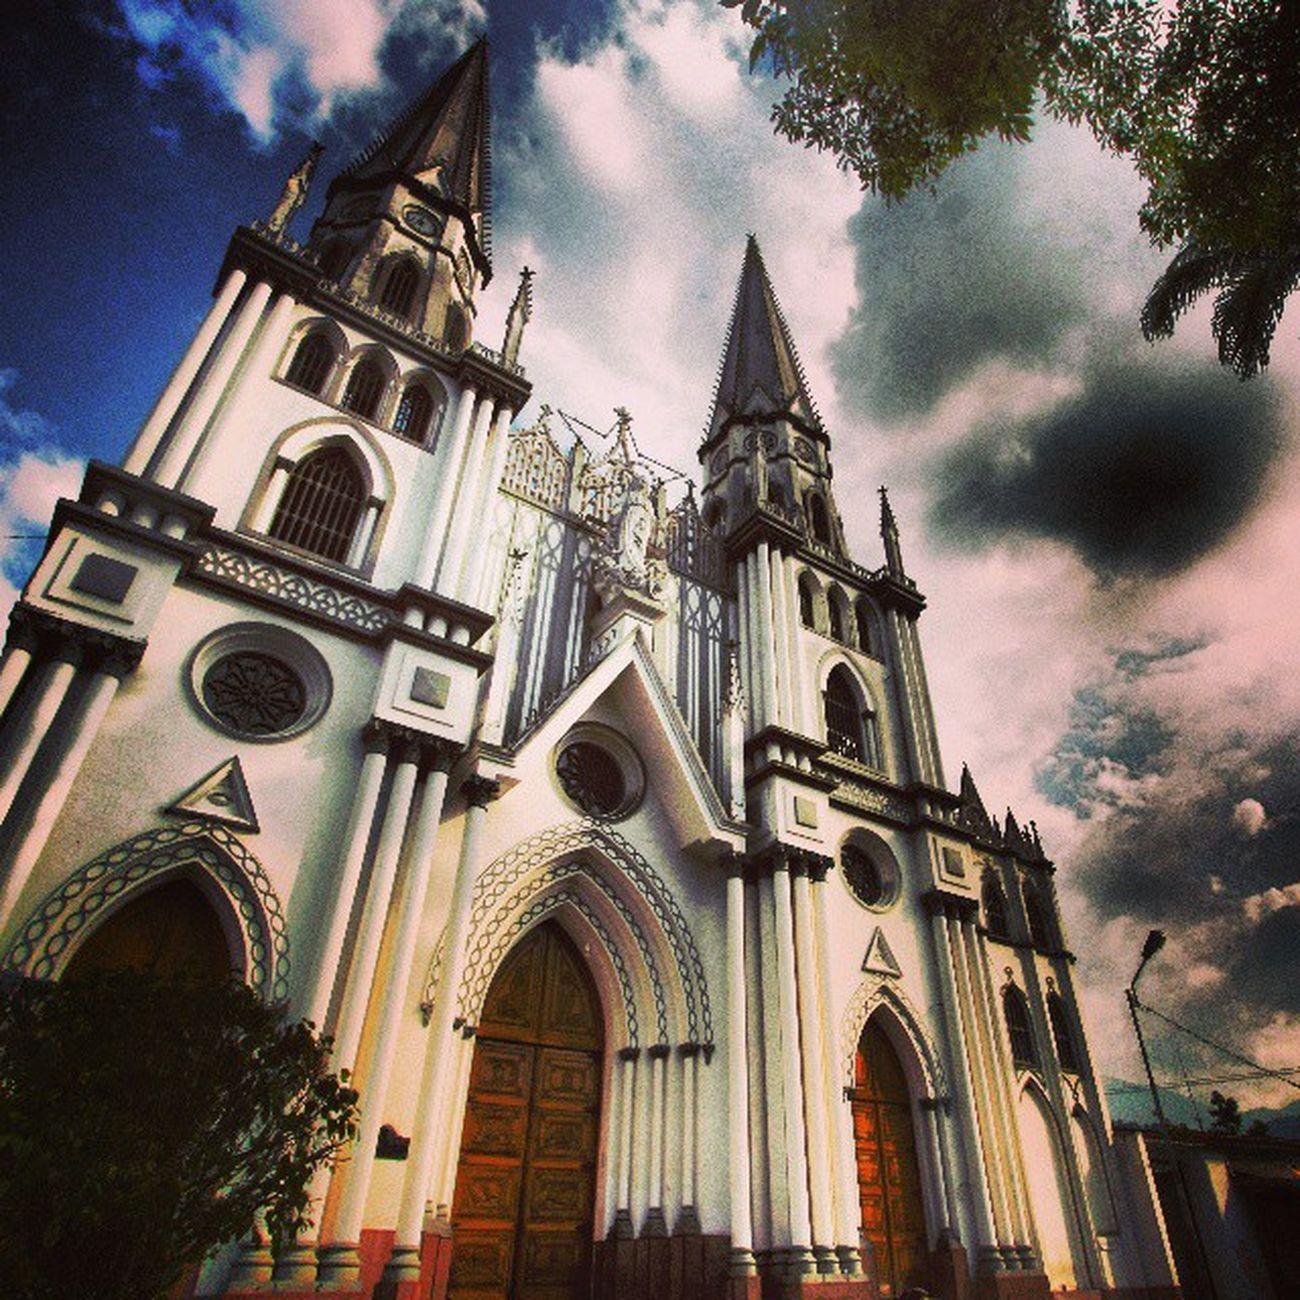 Iglesia de Los Ángeles de La Grita Tachira  Venezuela Ig_tachira IG_Venezuela Igerssc IgersVenezuela Venezuelaes Insta_ve Instavenezuela